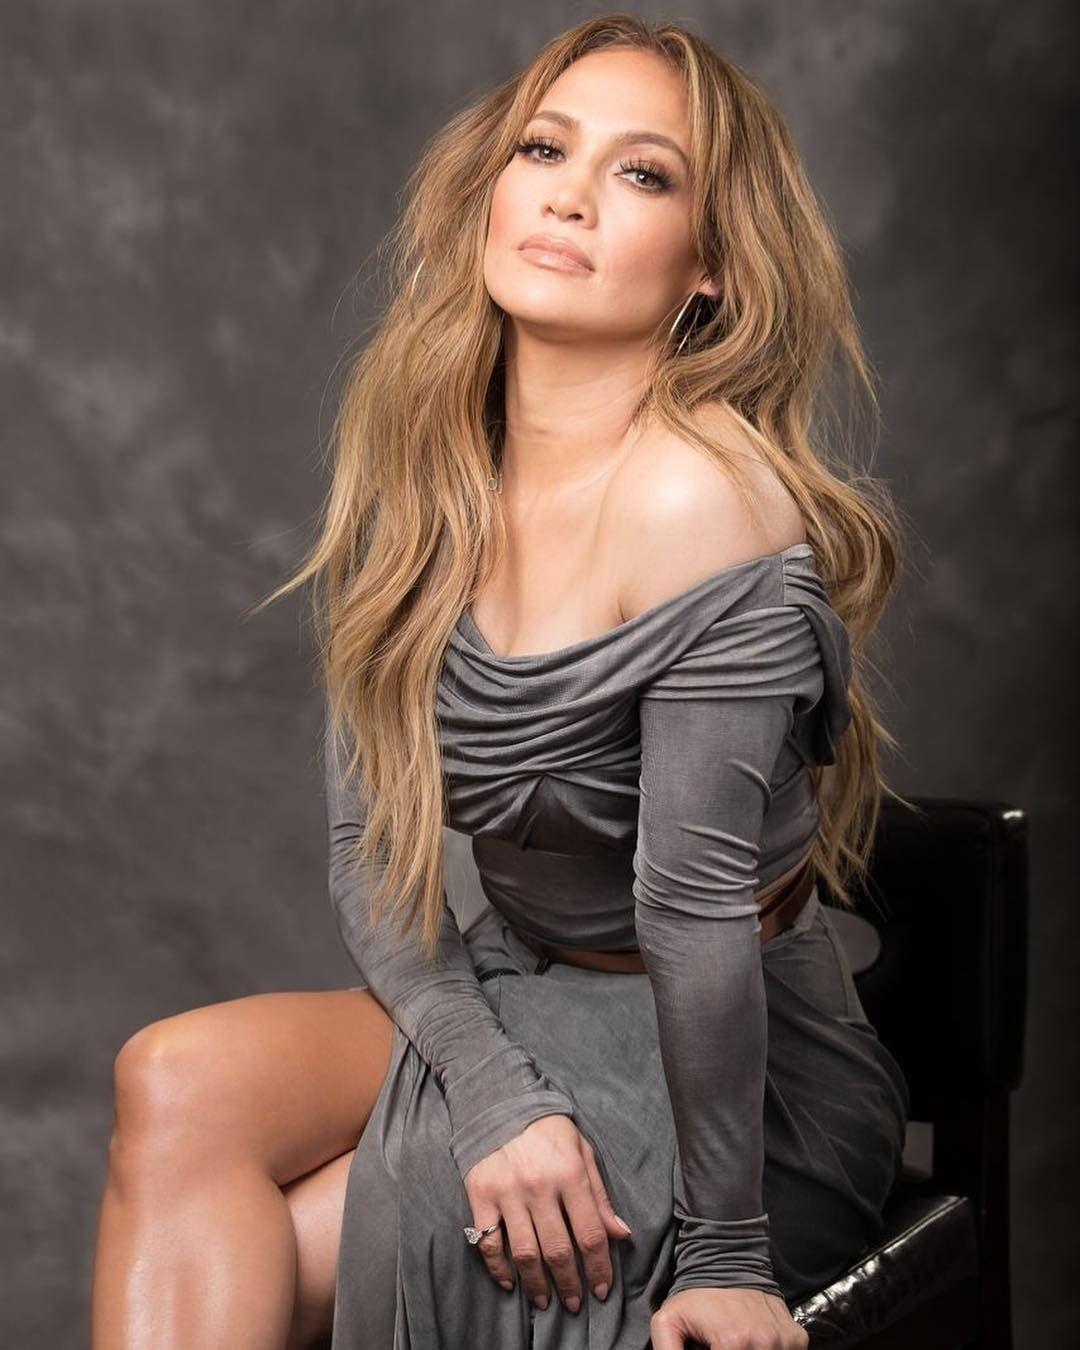 Paparazzi Maria Jose Lopez nude photos 2019